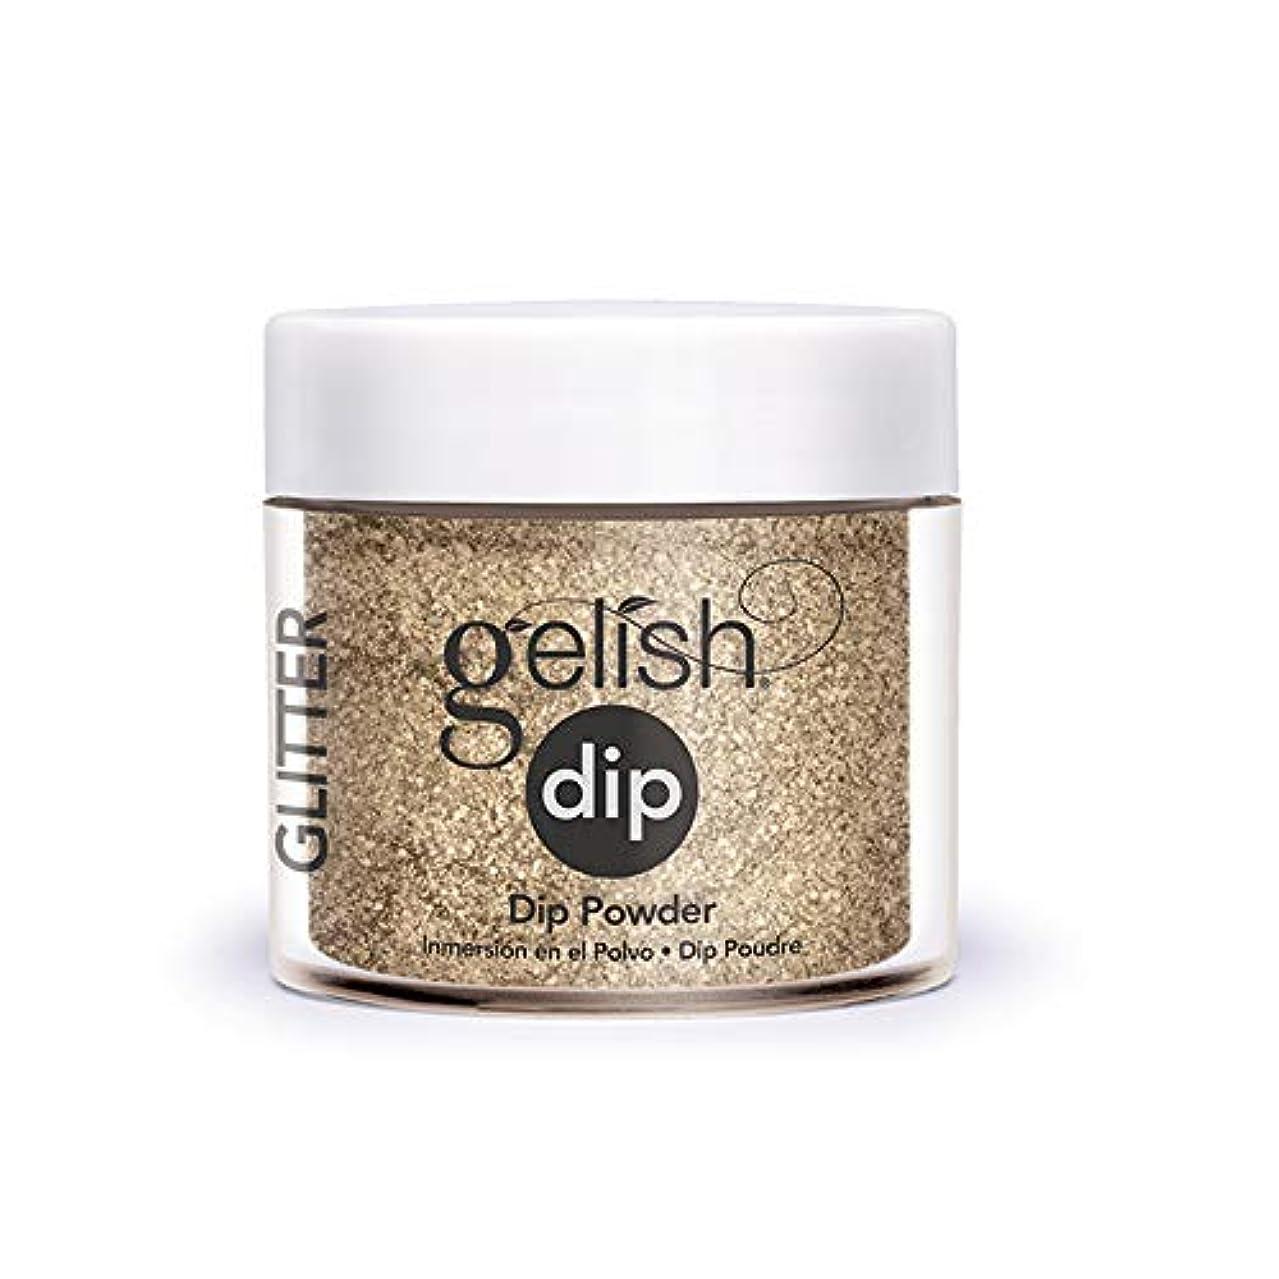 Harmony Gelish - Acrylic Dip Powder - Glitter & Gold - 23g / 0.8oz